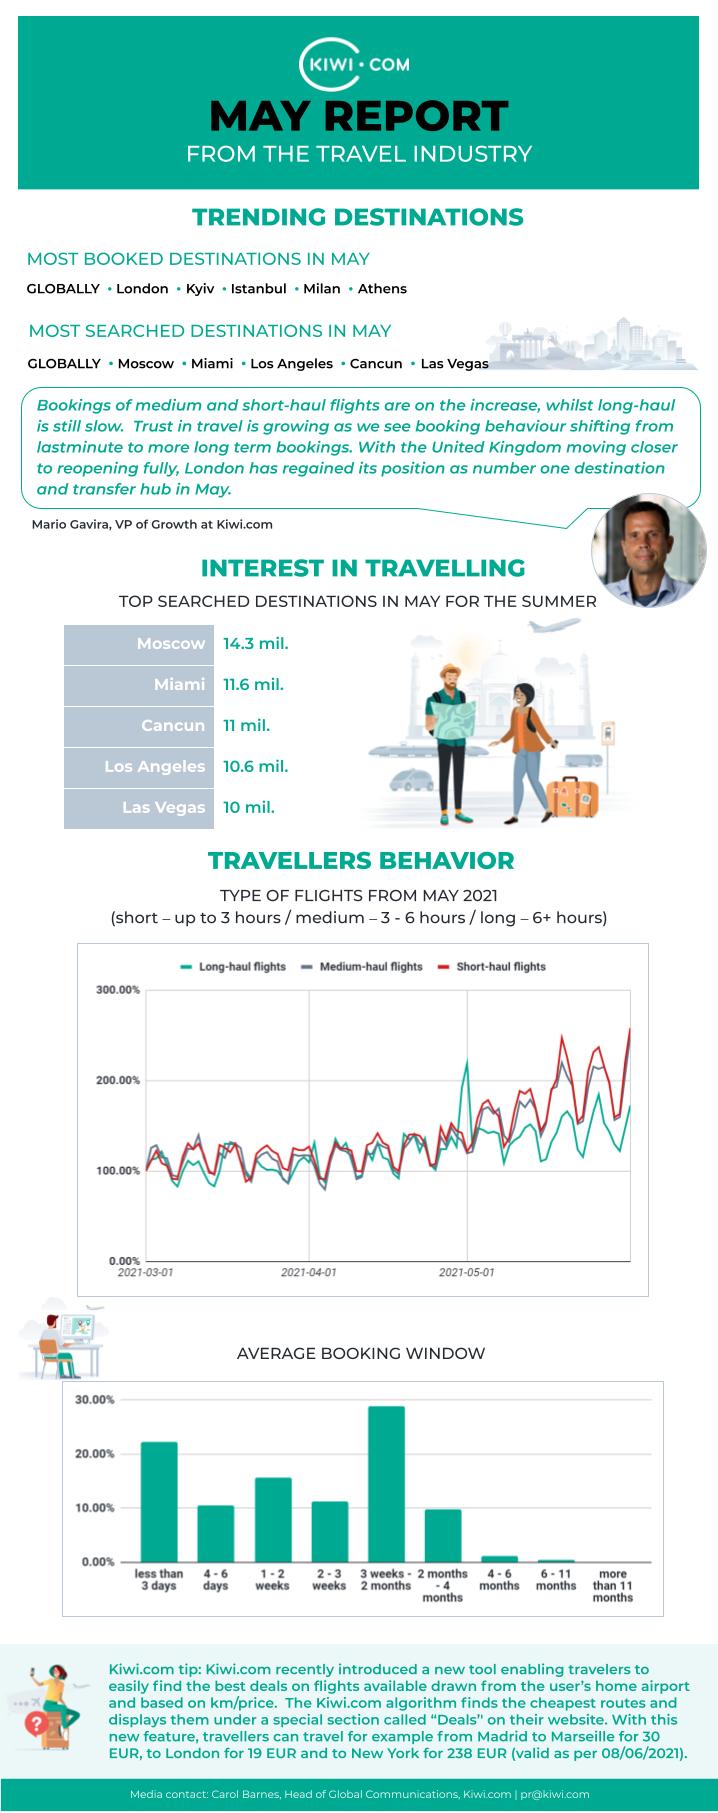 Kiwi.com travel report may 2021